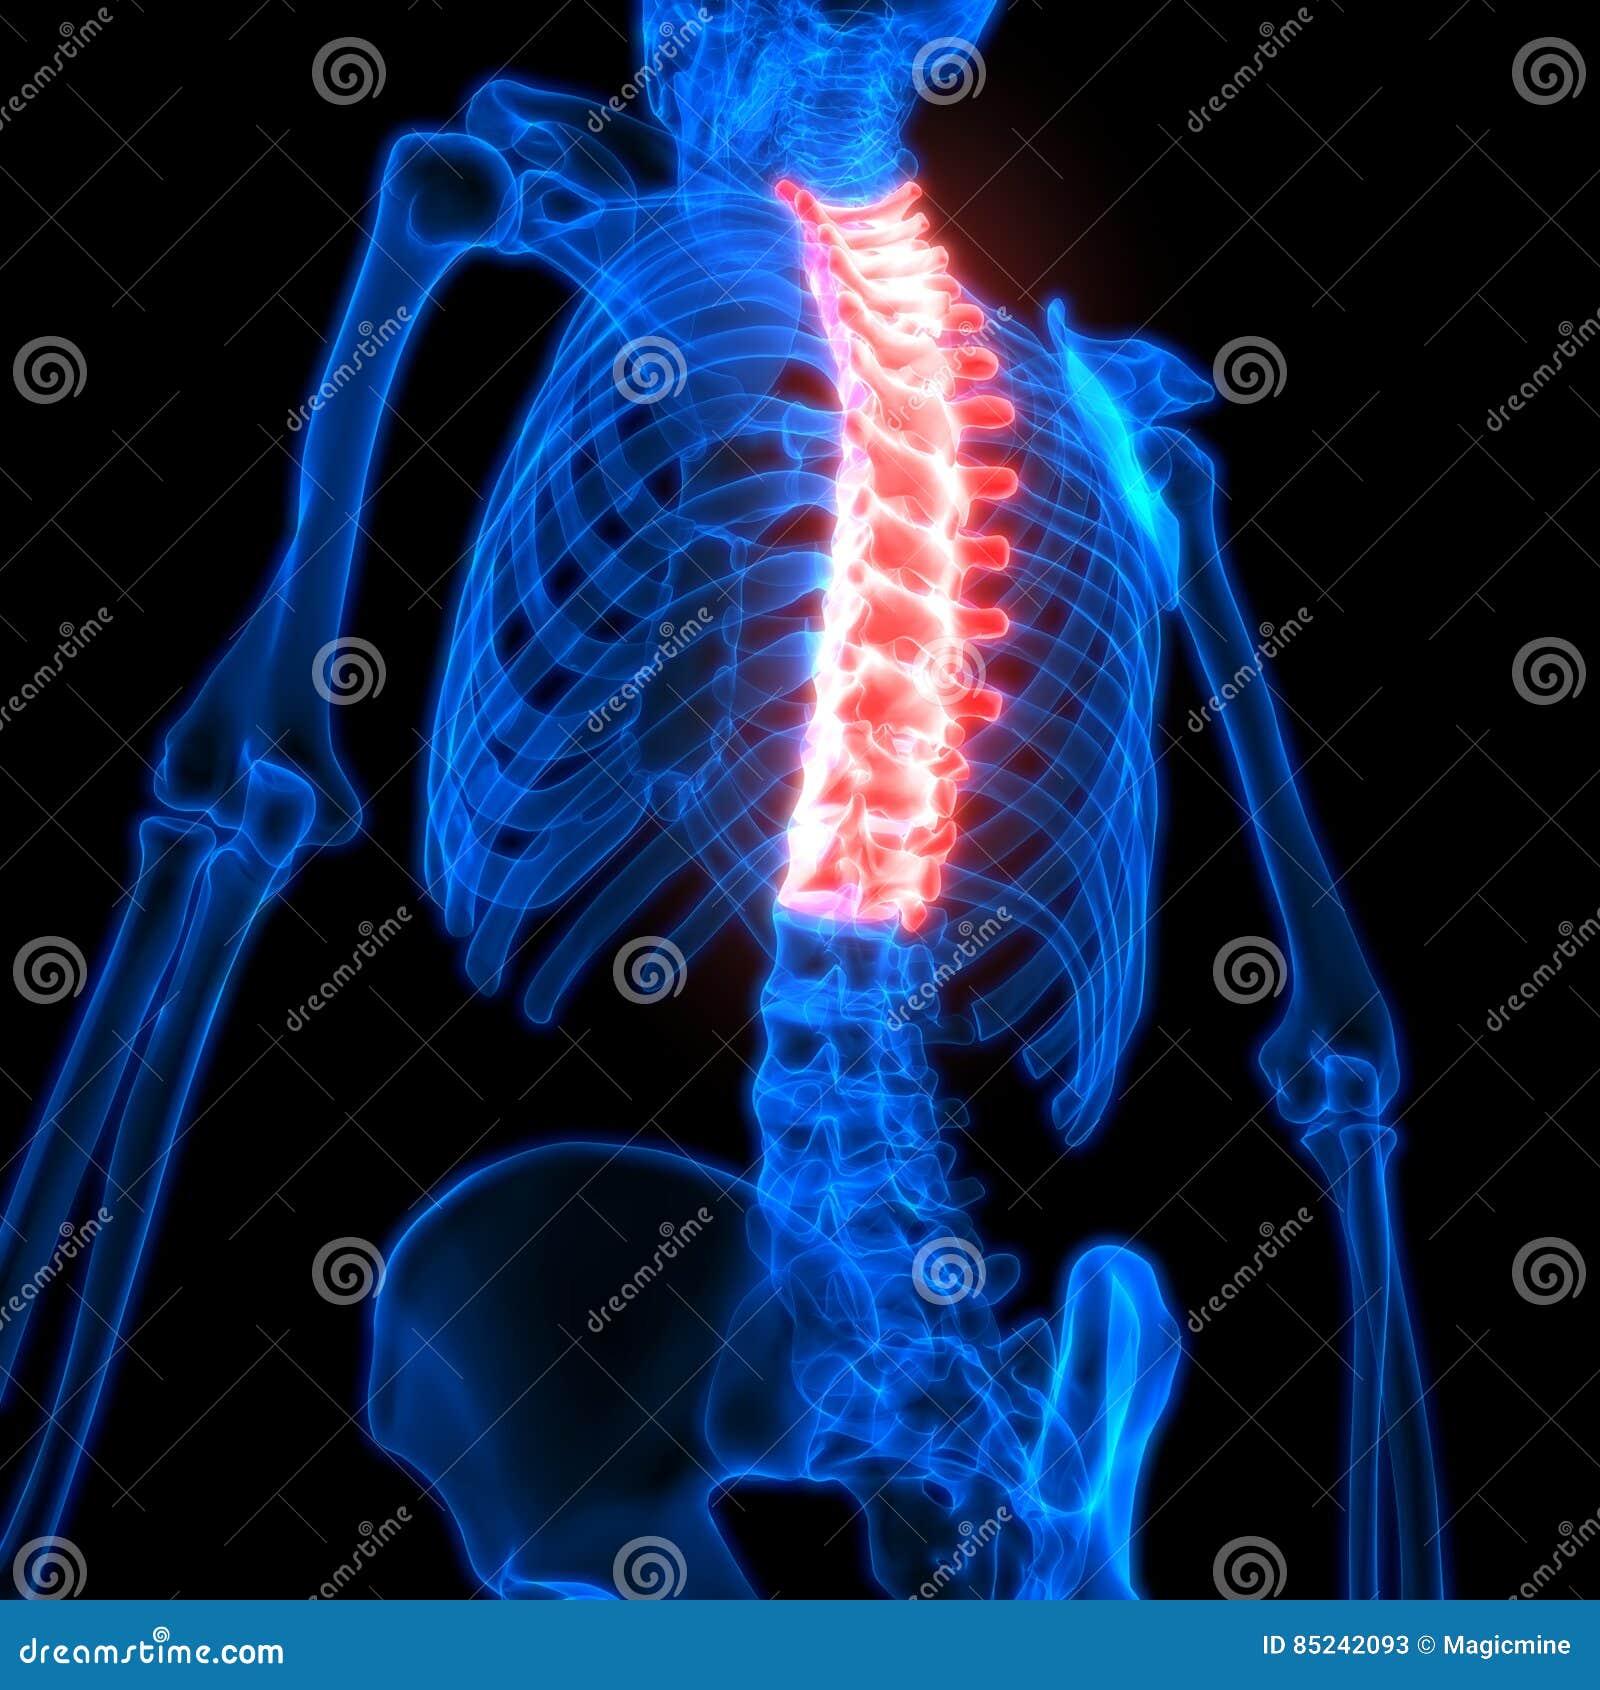 Spinal Cord Thoracic Vertebrae A Part Of Human Skeleton Anatomy